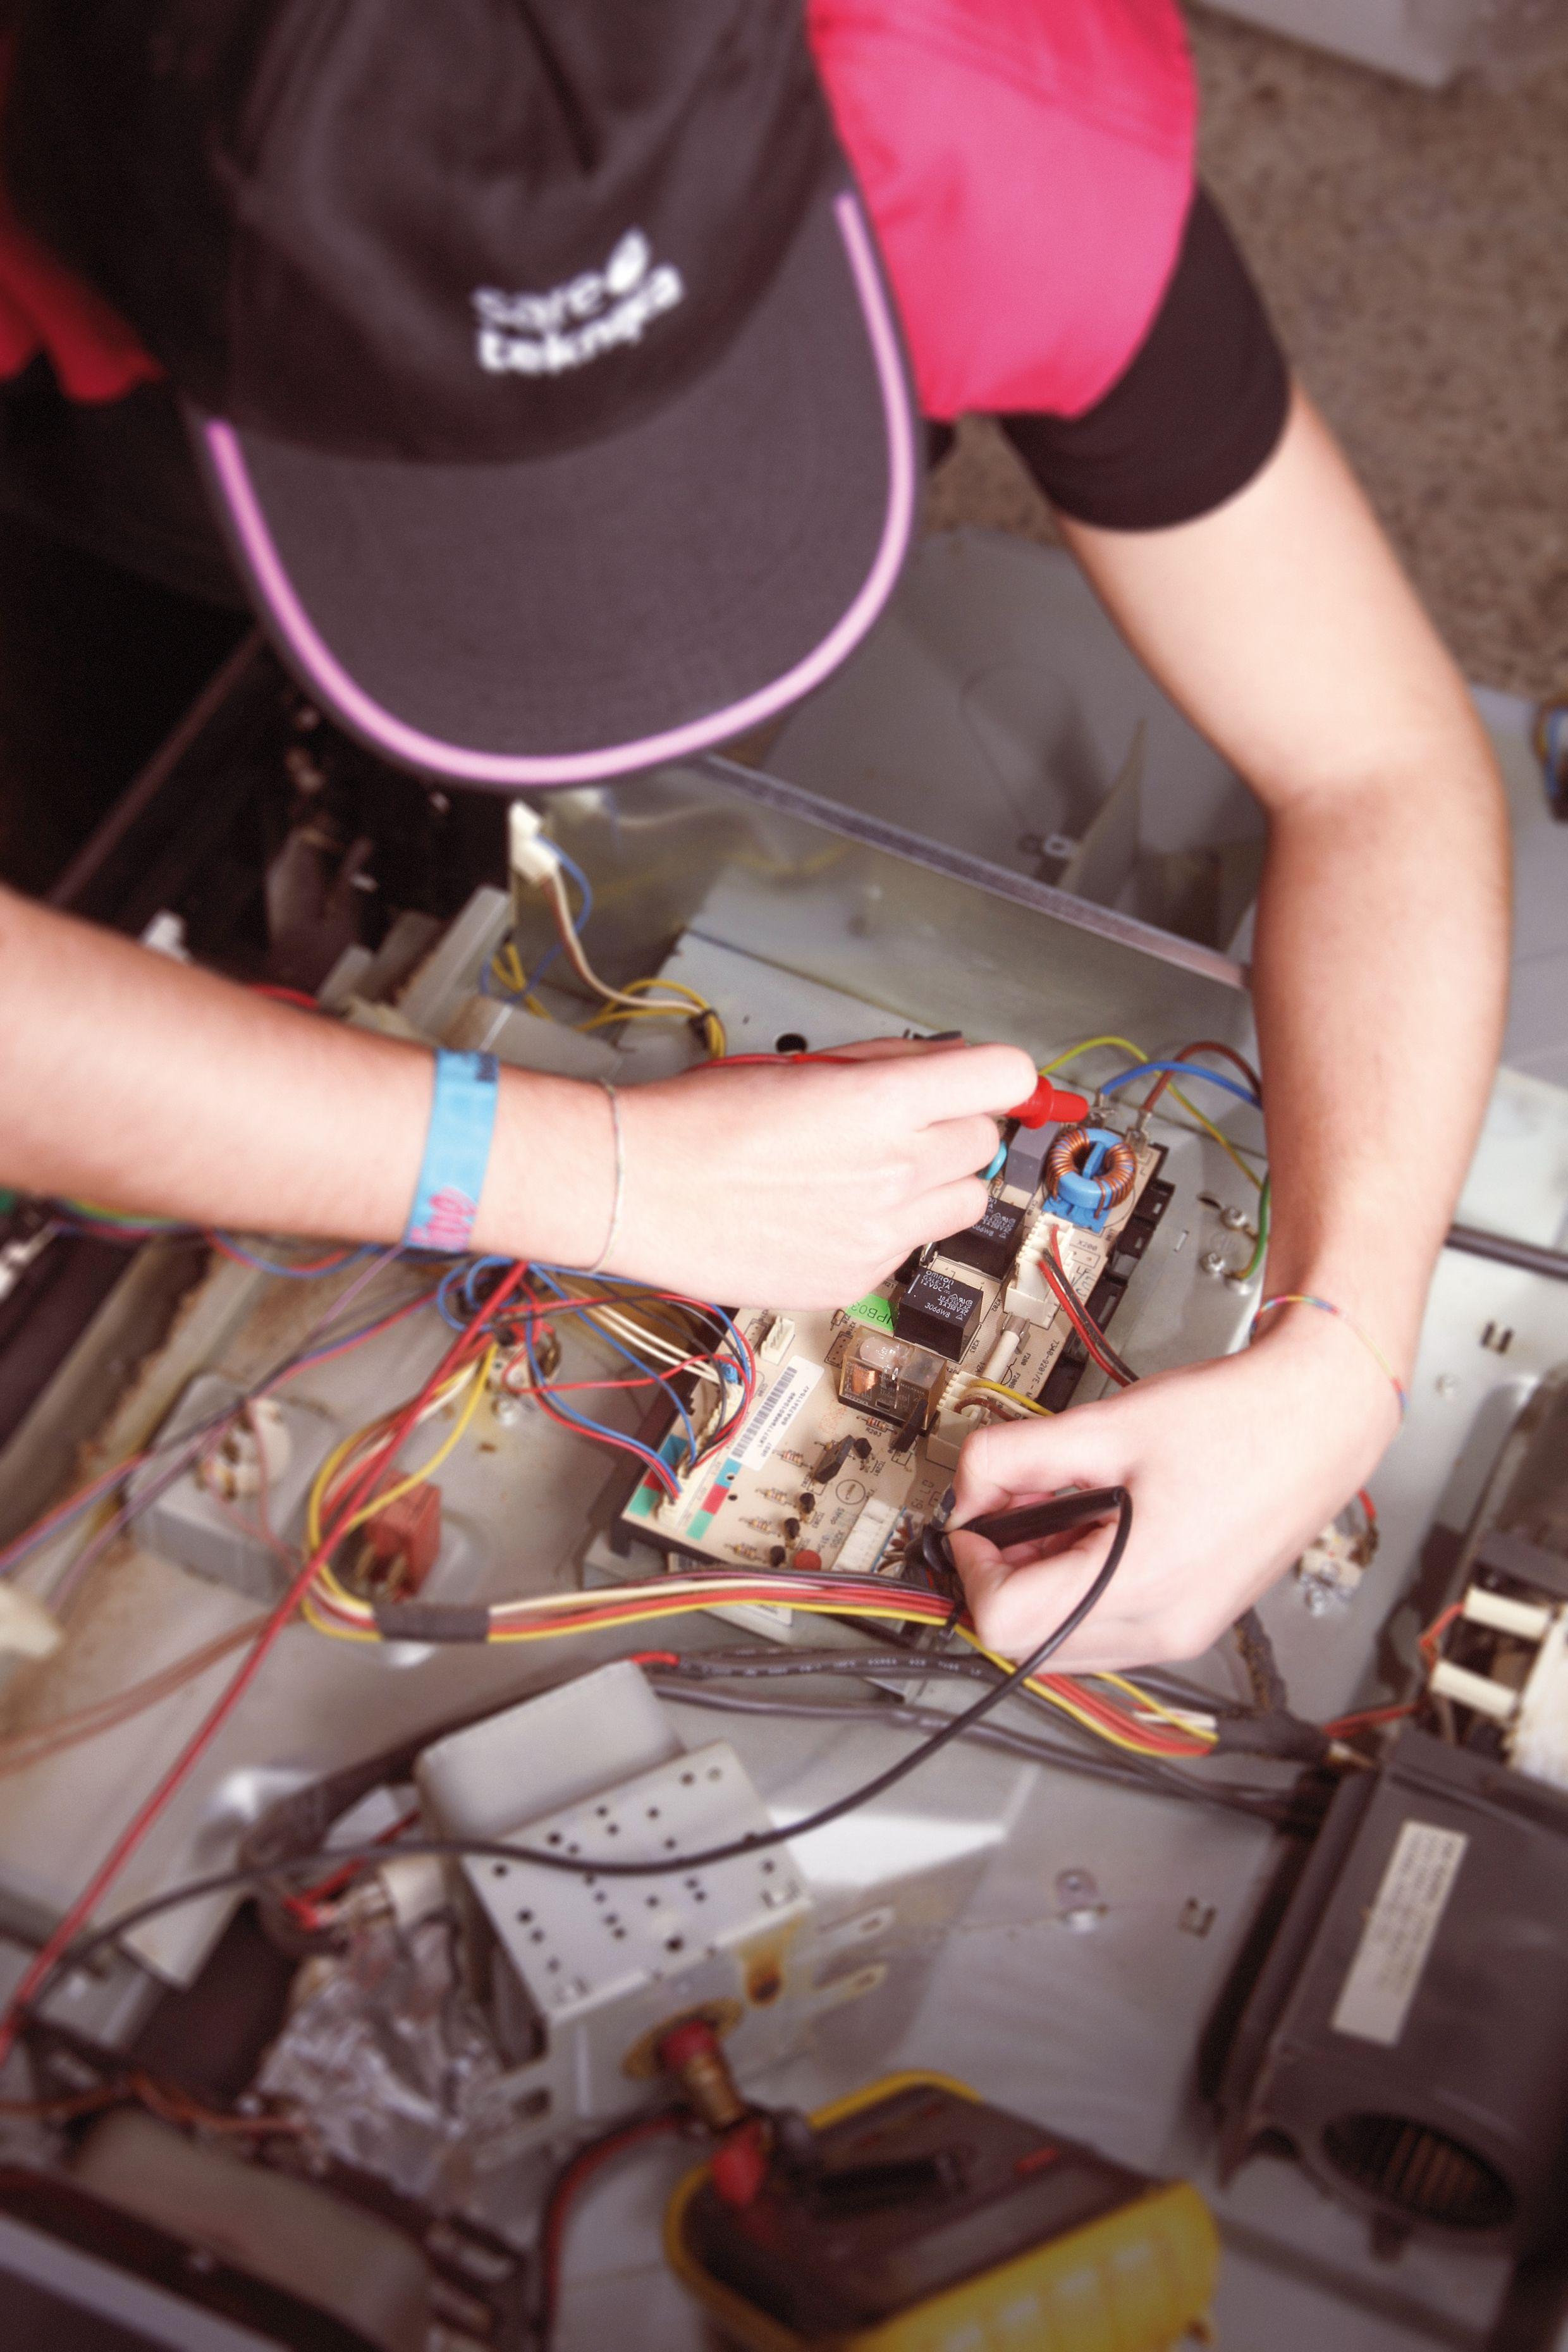 Técnico reparando equipo electrónico